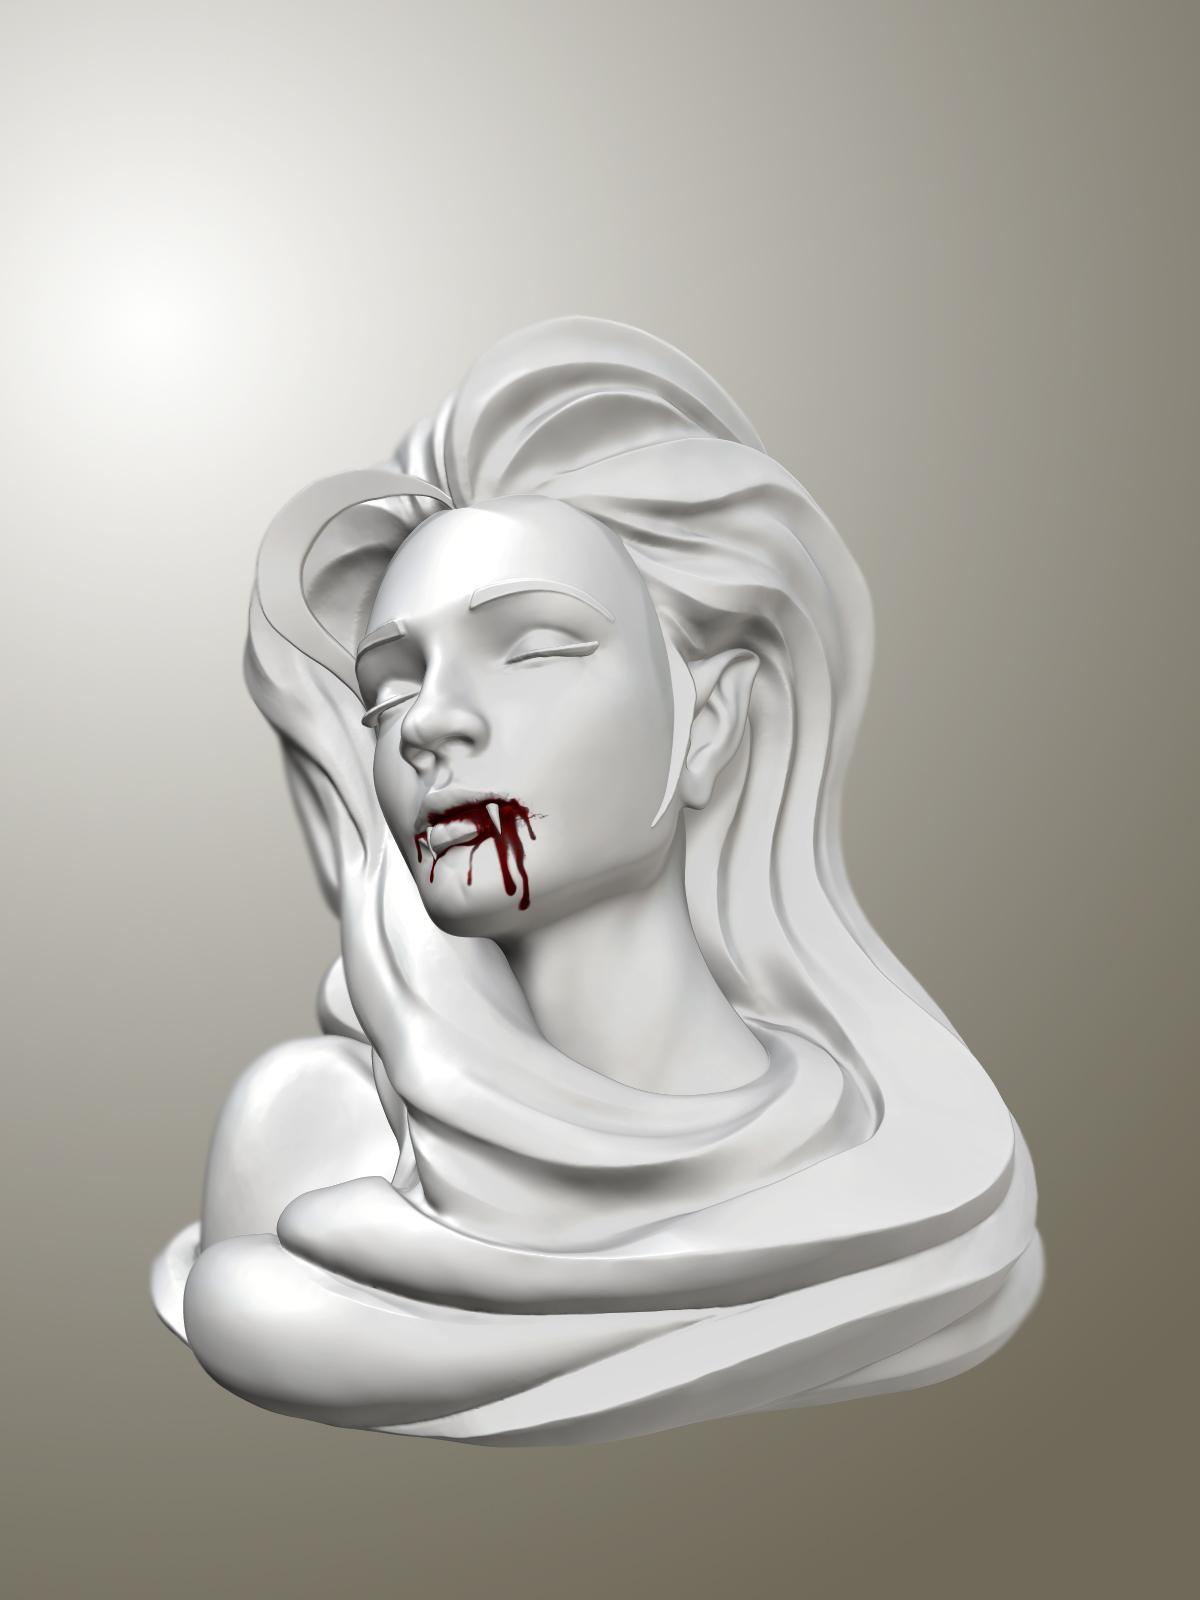 3Dprint Sculpture Vampire Girl 15X11 5X12 5 Cm Free 3D Model 3D Printable Obj -8617